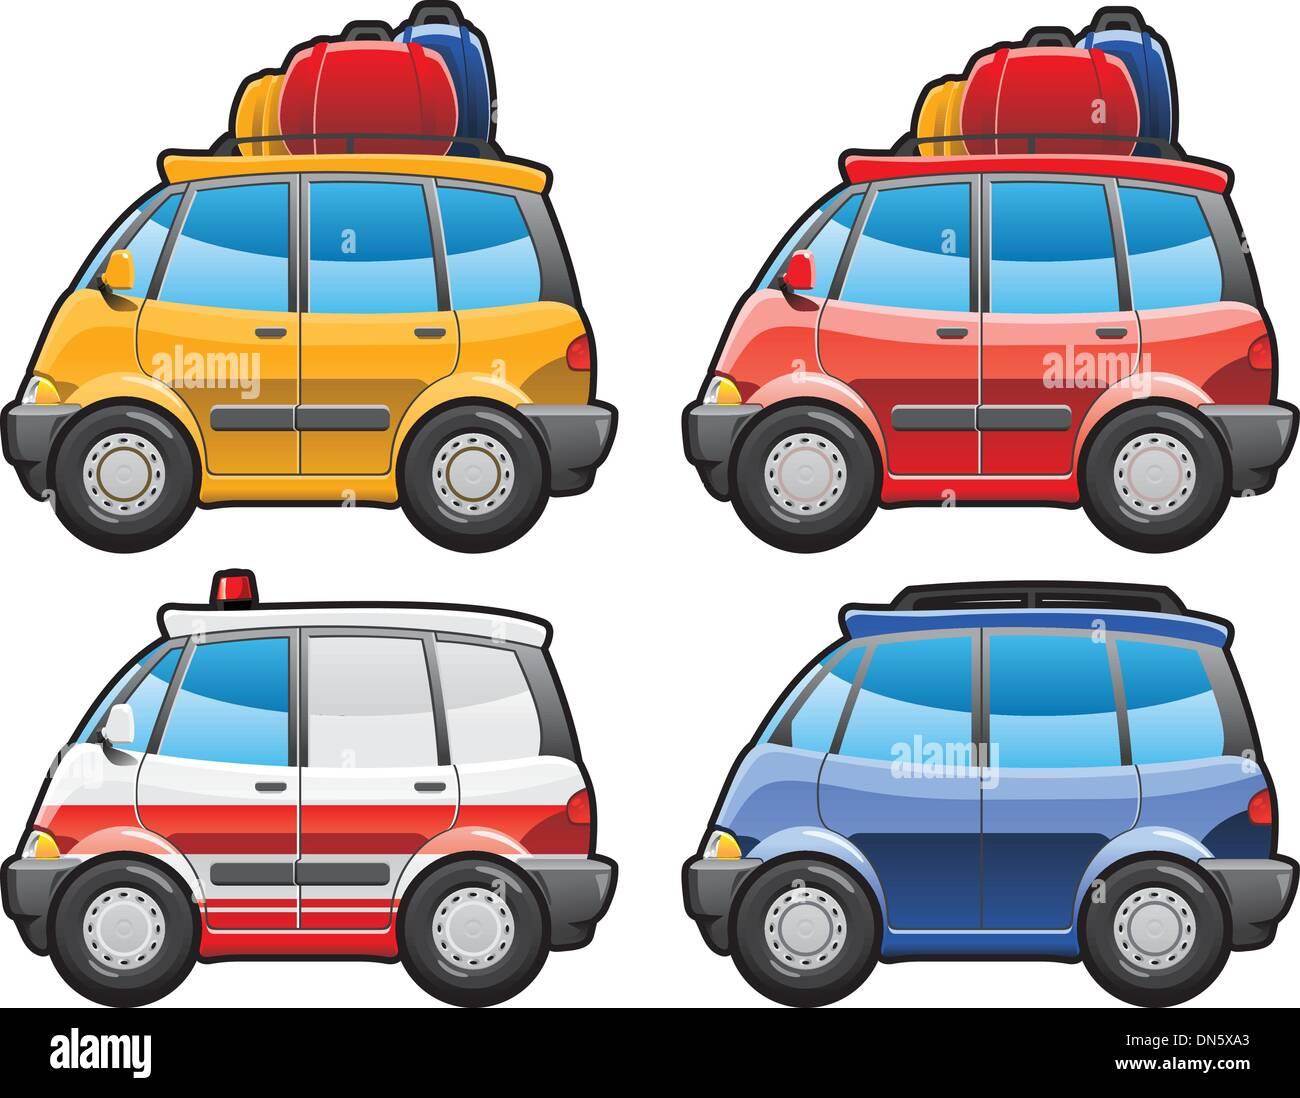 minivan, ambulance car - Stock Vector